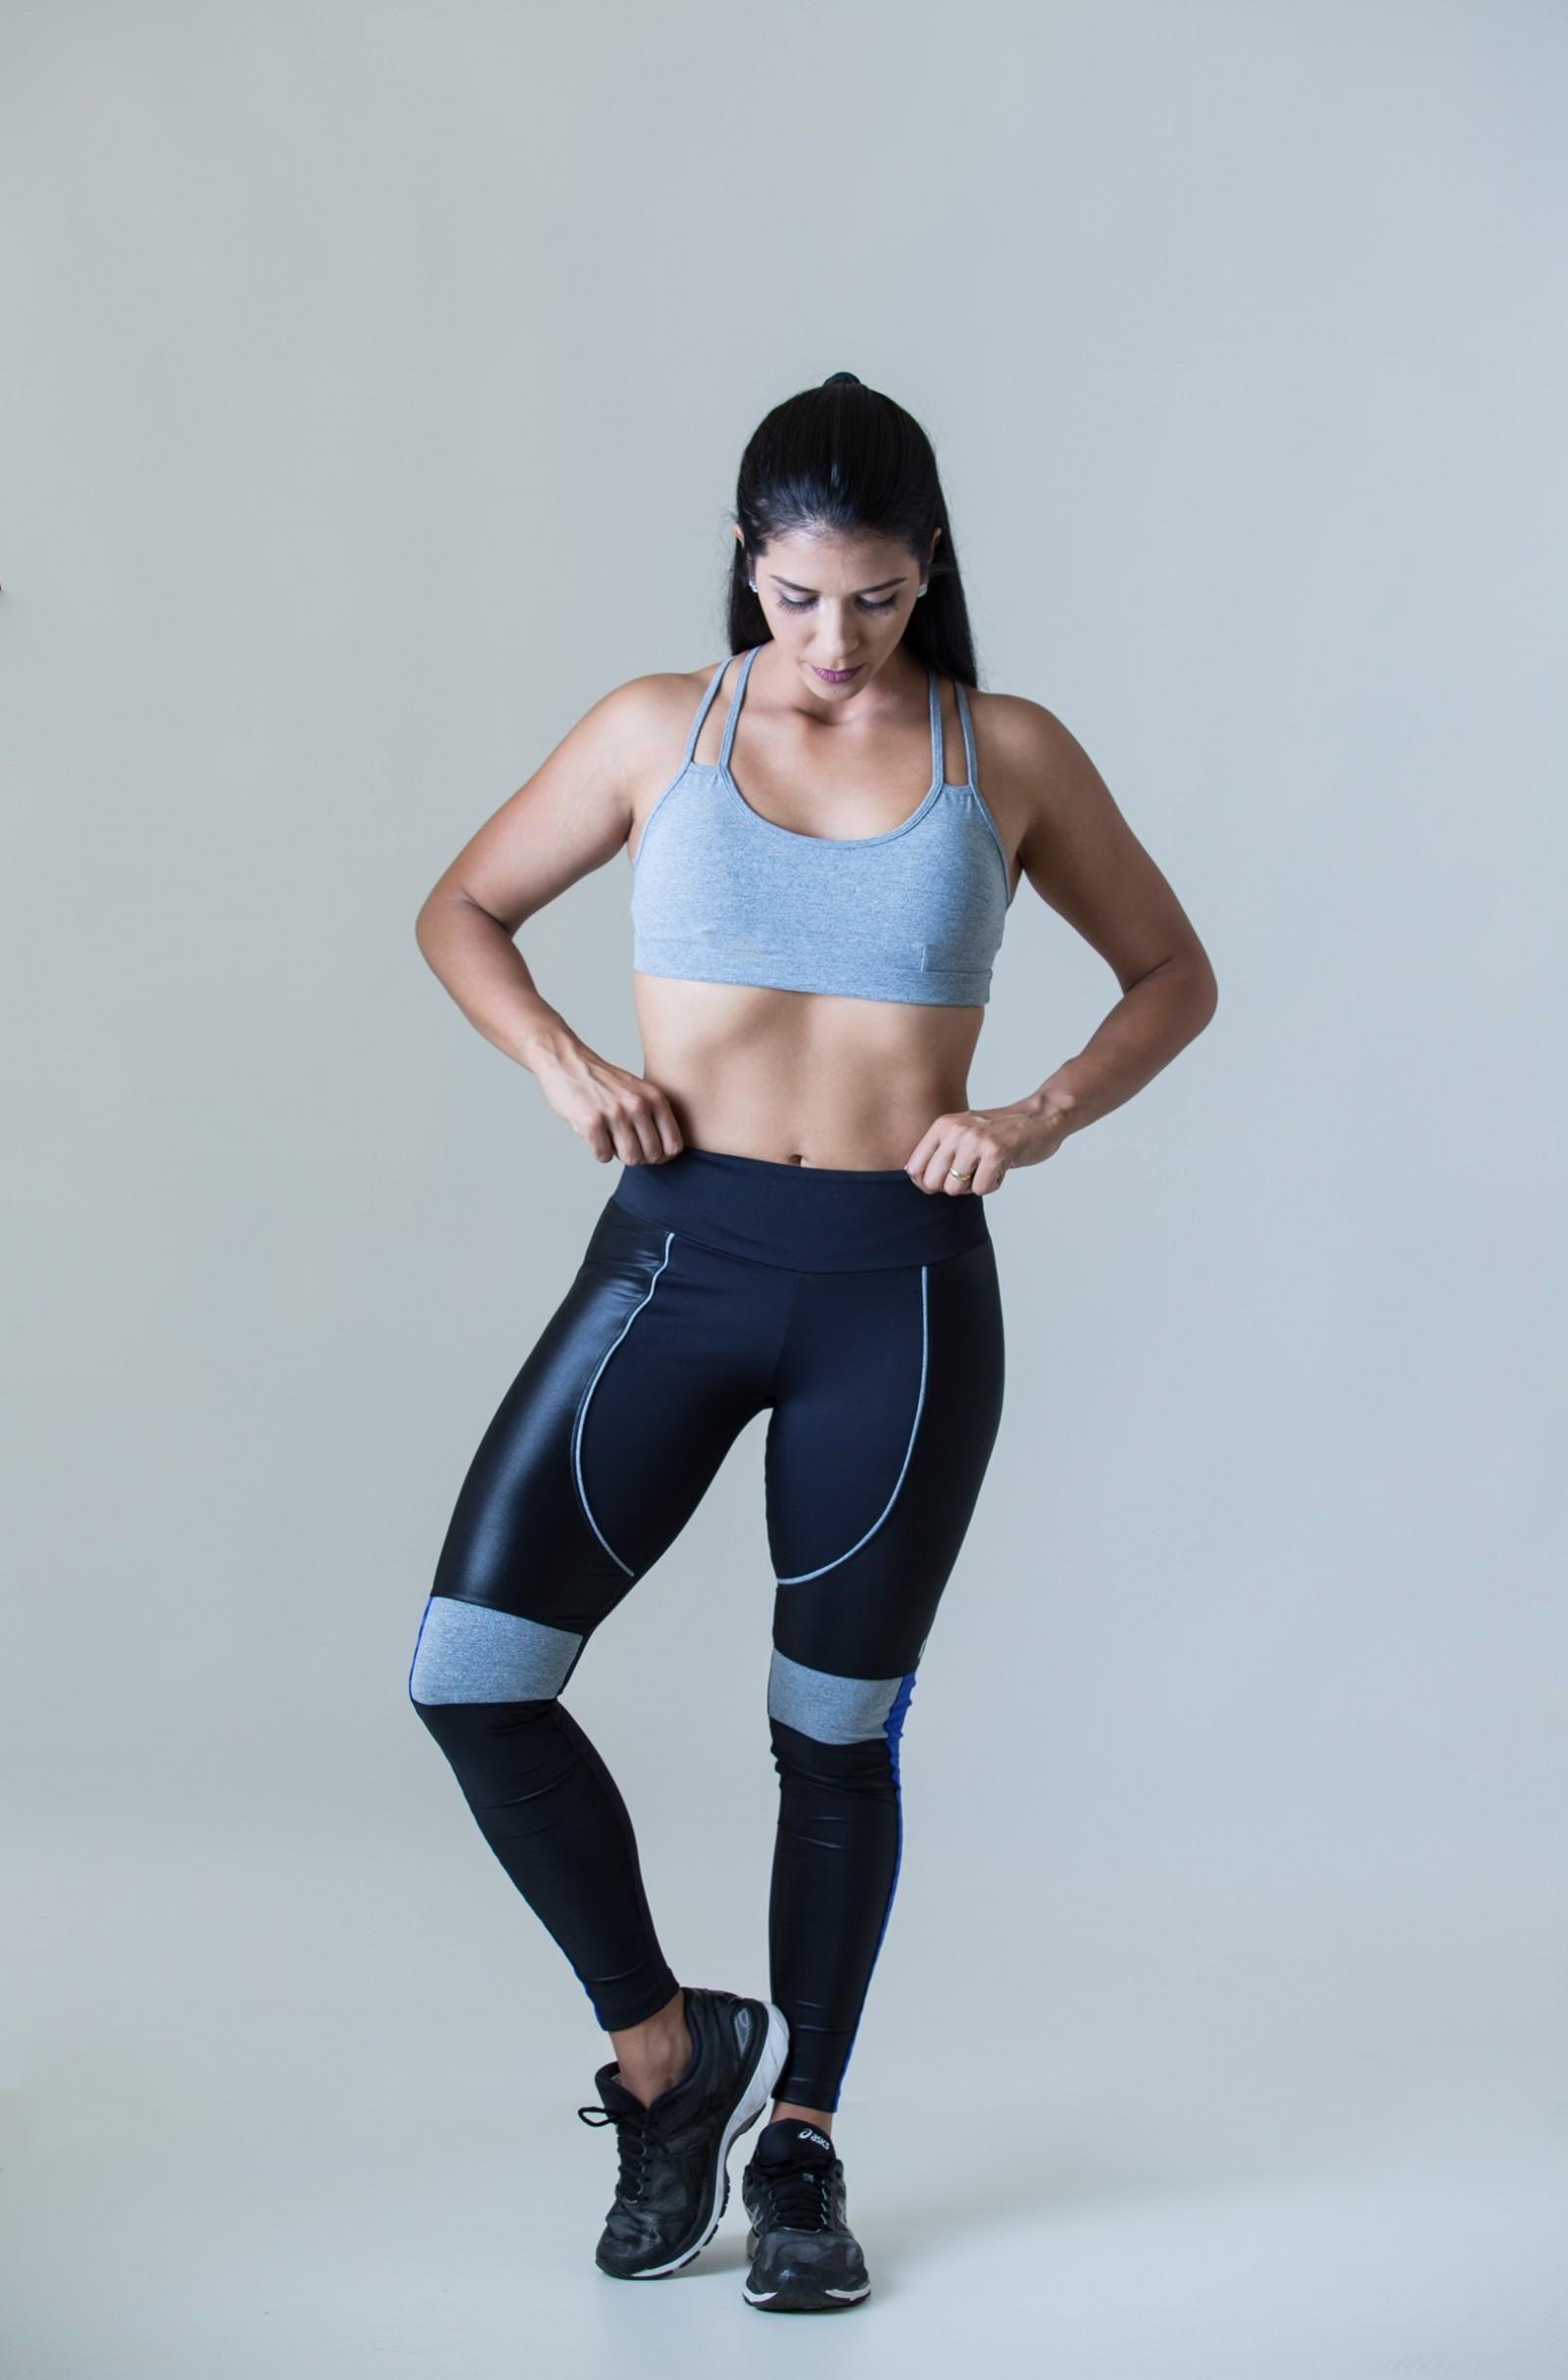 Legging Perfection Mescla, Coleção Plenitude - NKT Fitwear Moda Fitness